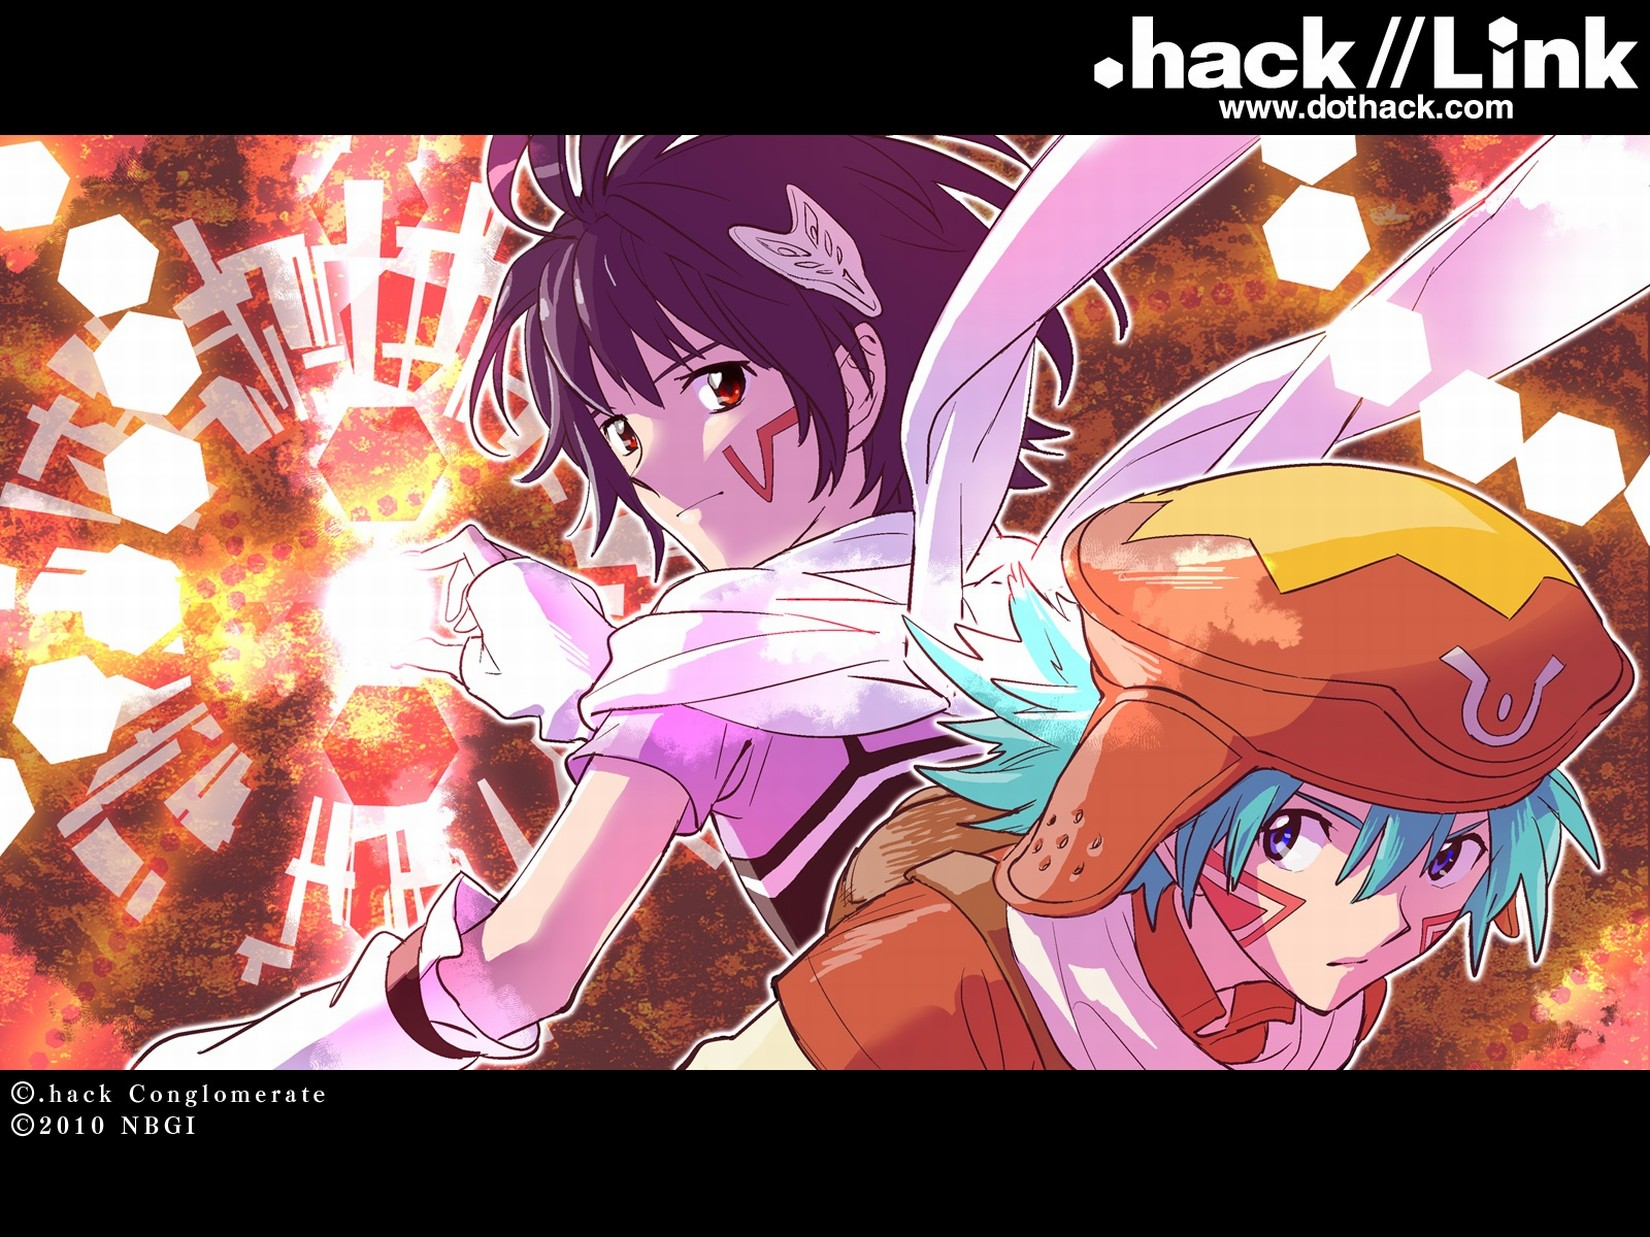 аниме девушки из аниме хак // ЗНАК / .hack // Link